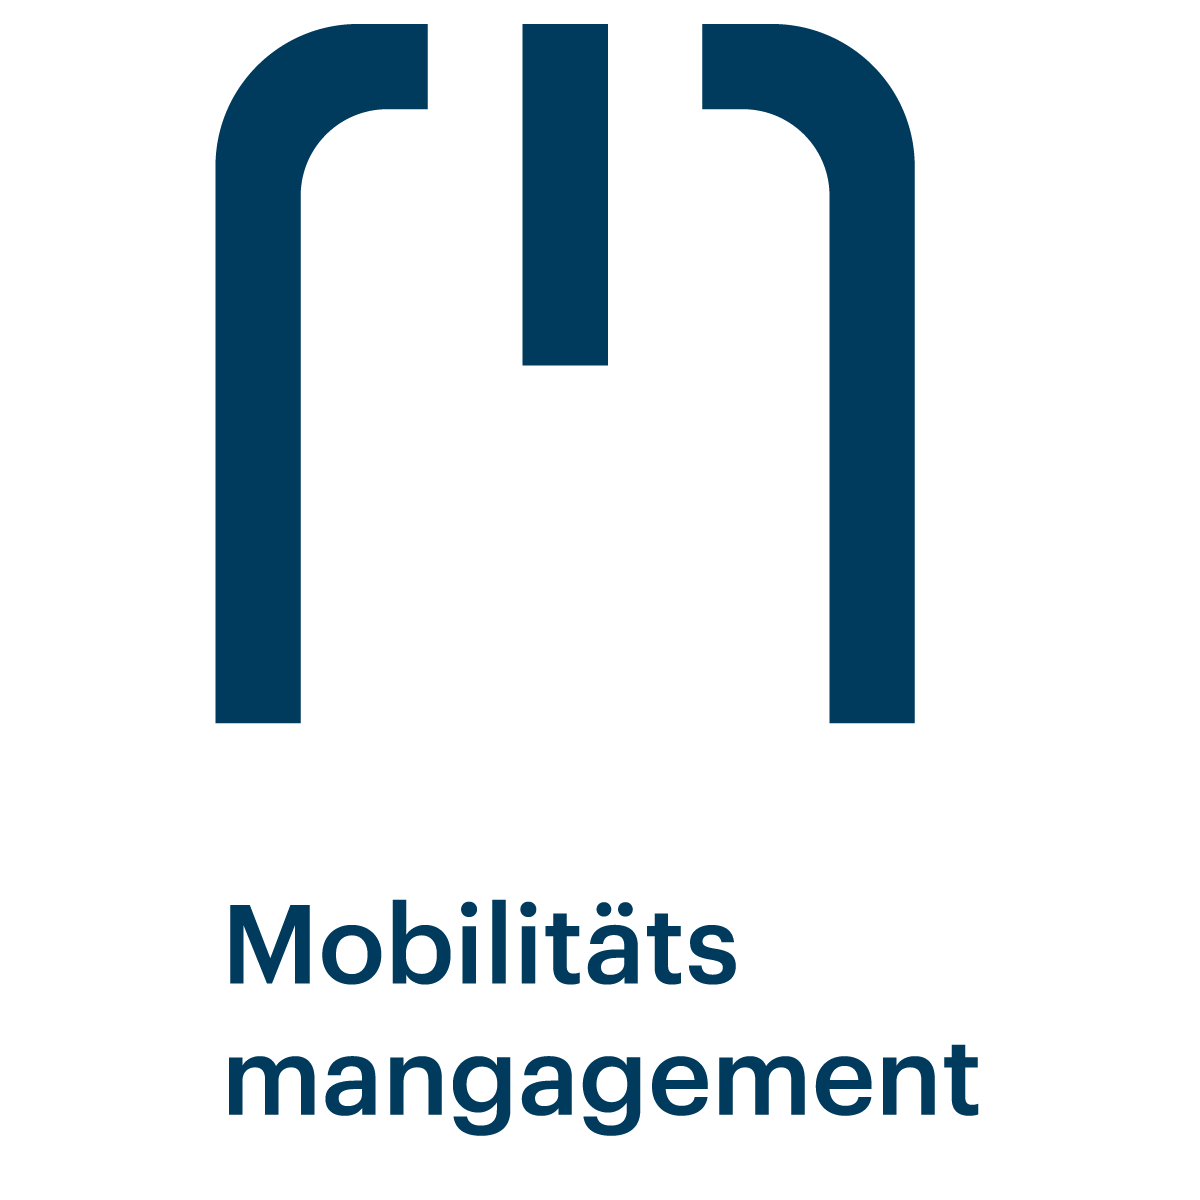 Mobilitaetsmanagement